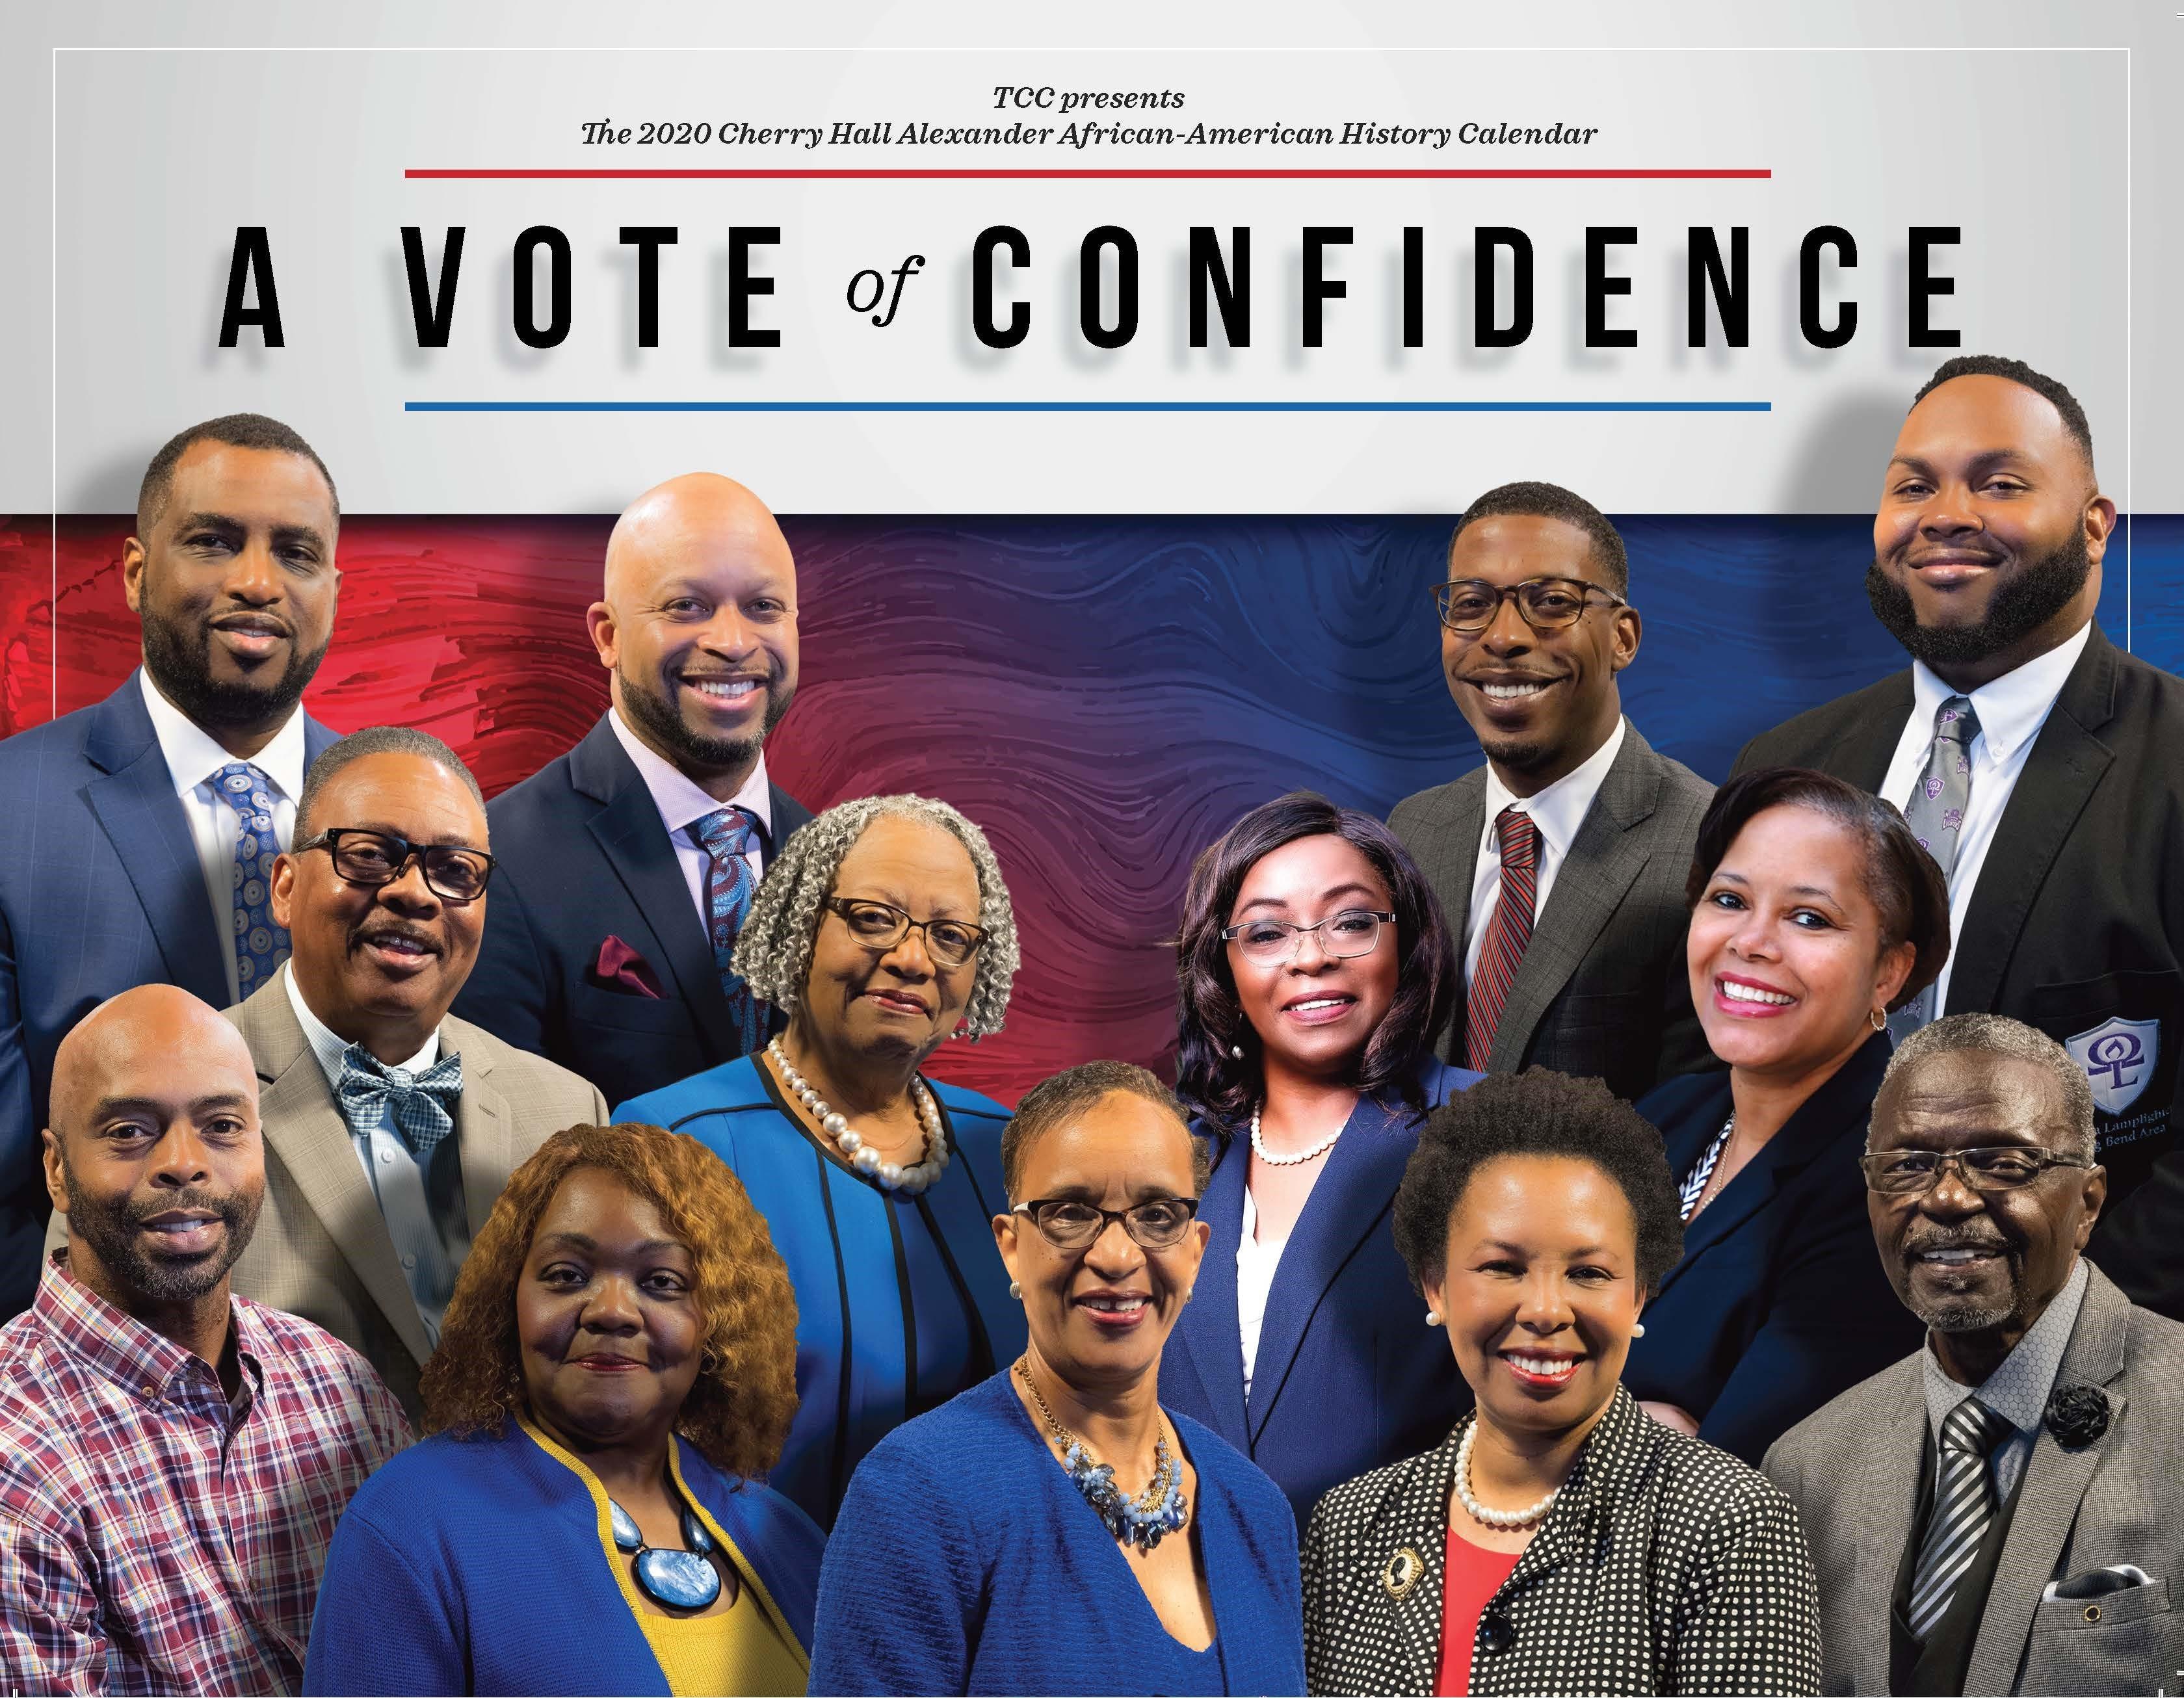 Tcc Fall 2021 Calendar TCC set to release 2020 African American History Calendar